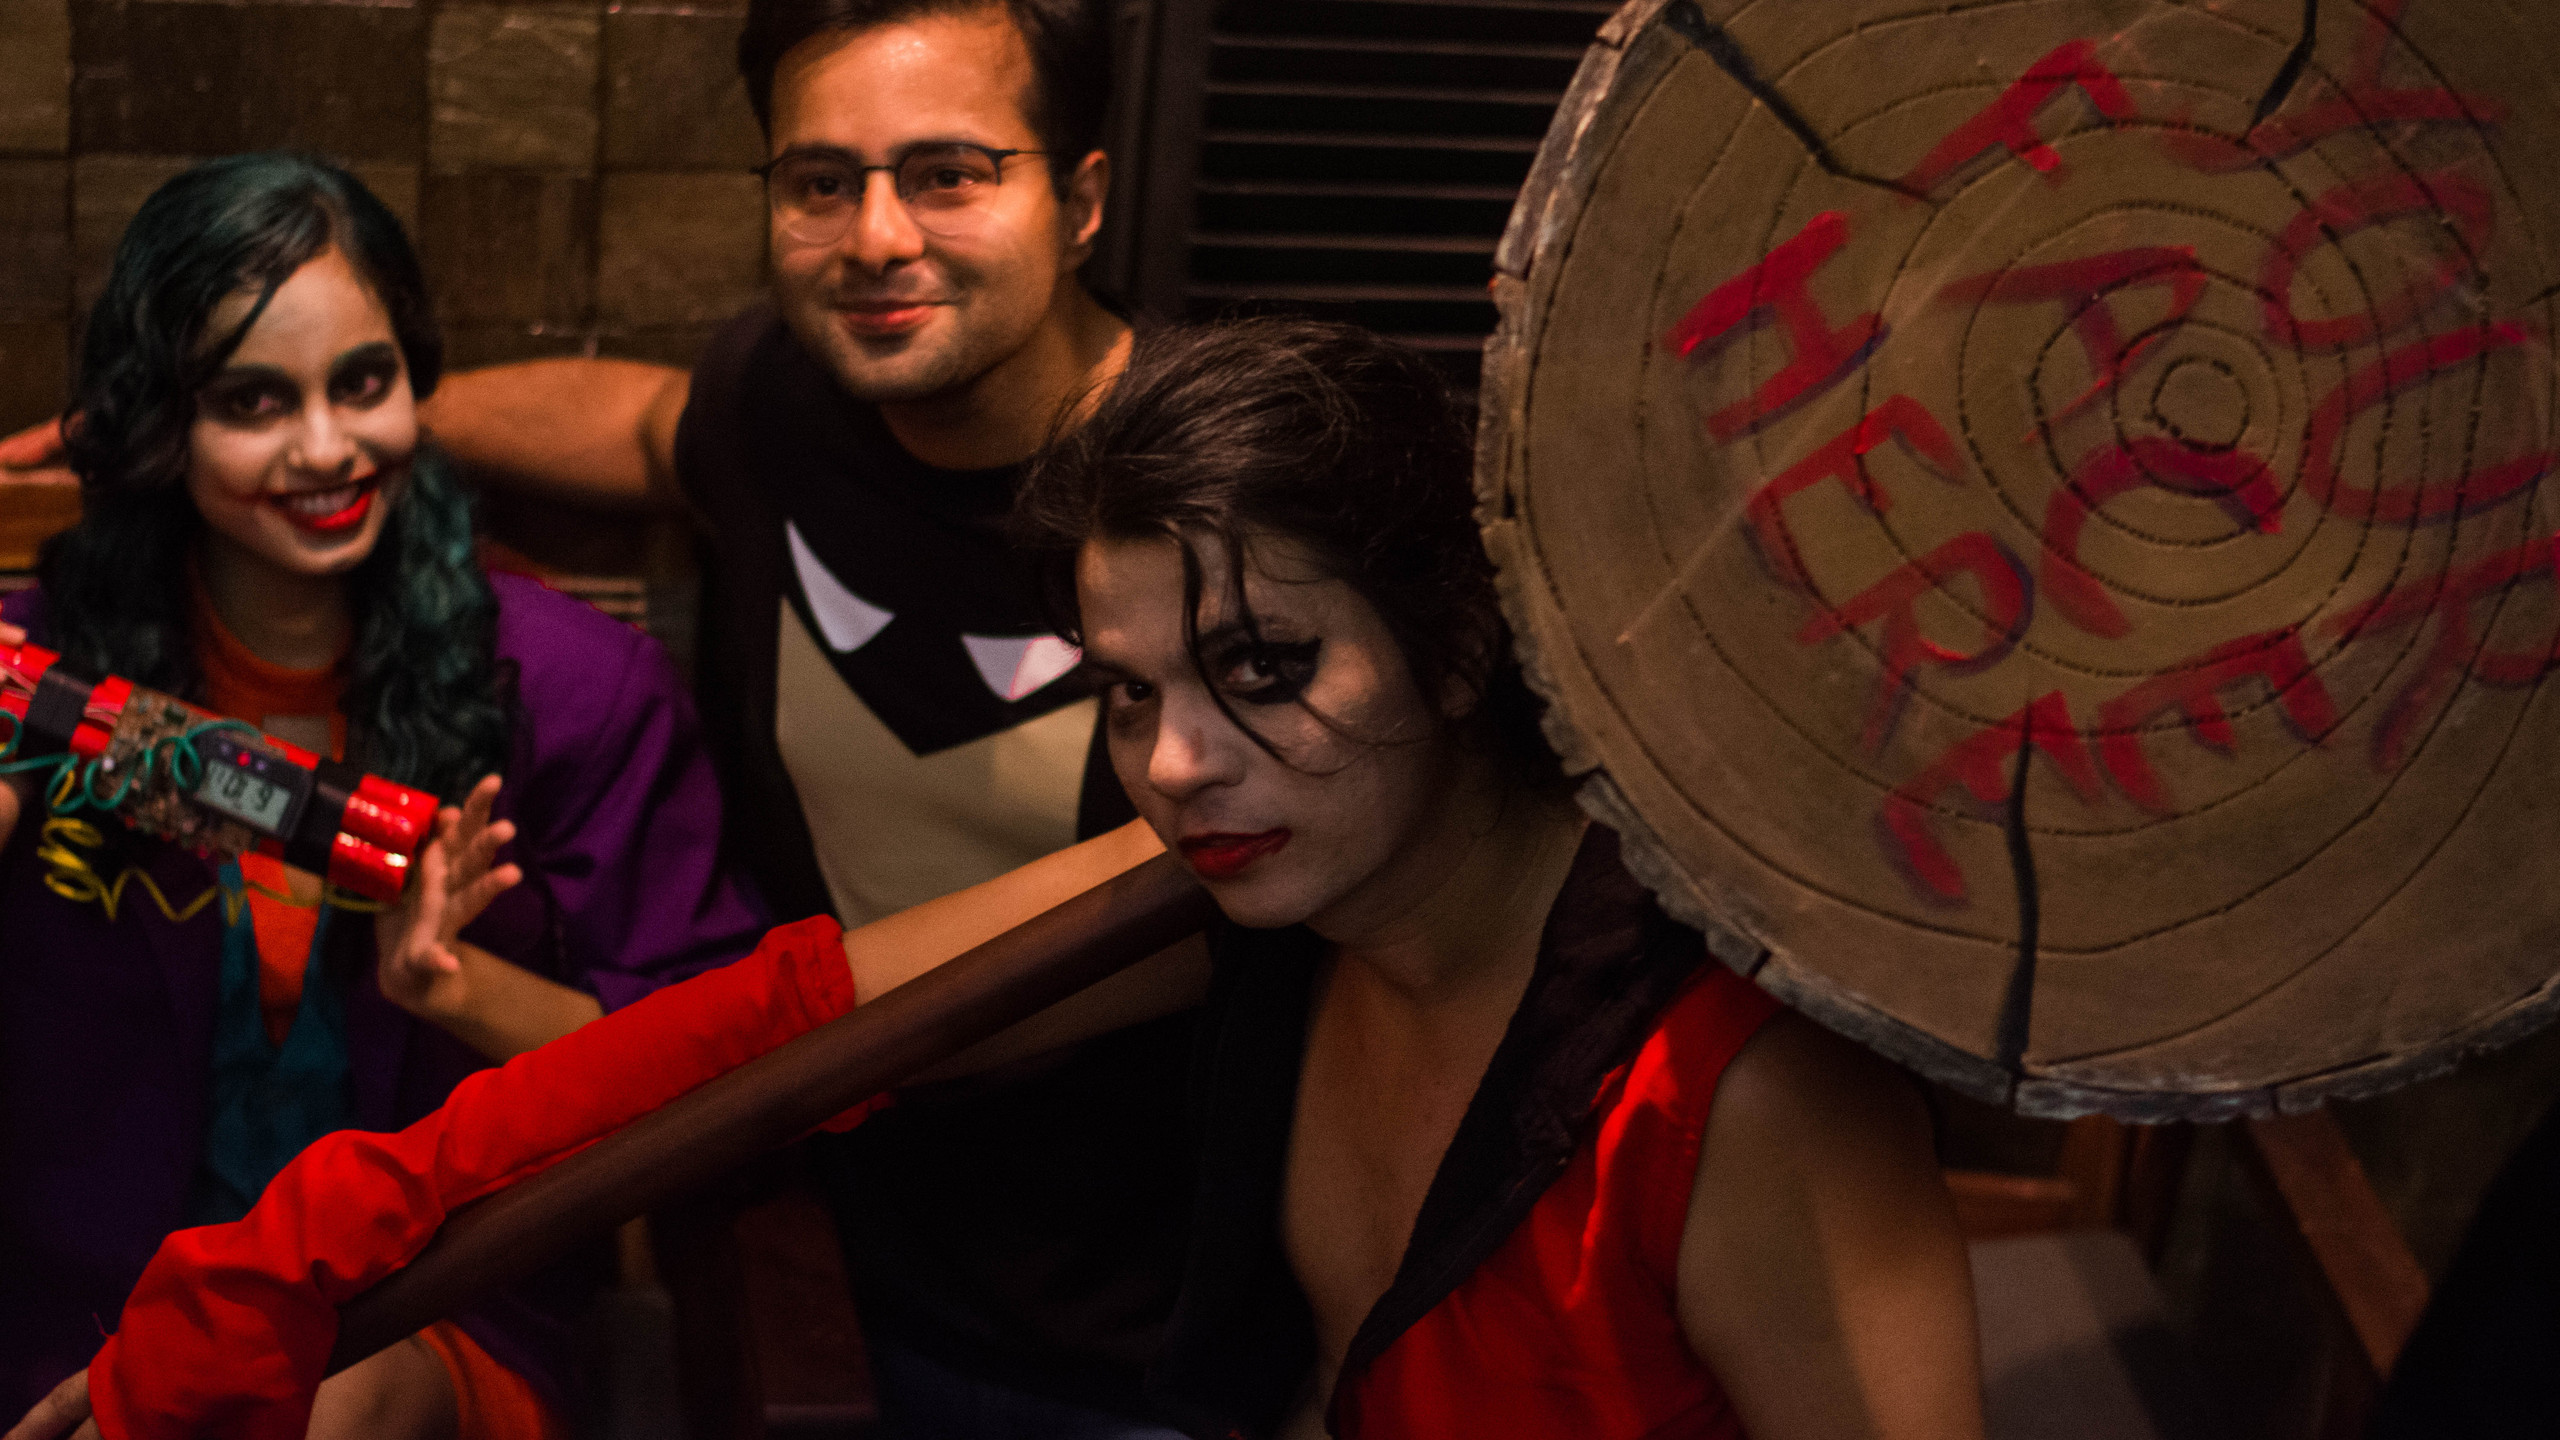 Saurabh as Harley Quinn-Gender Bend